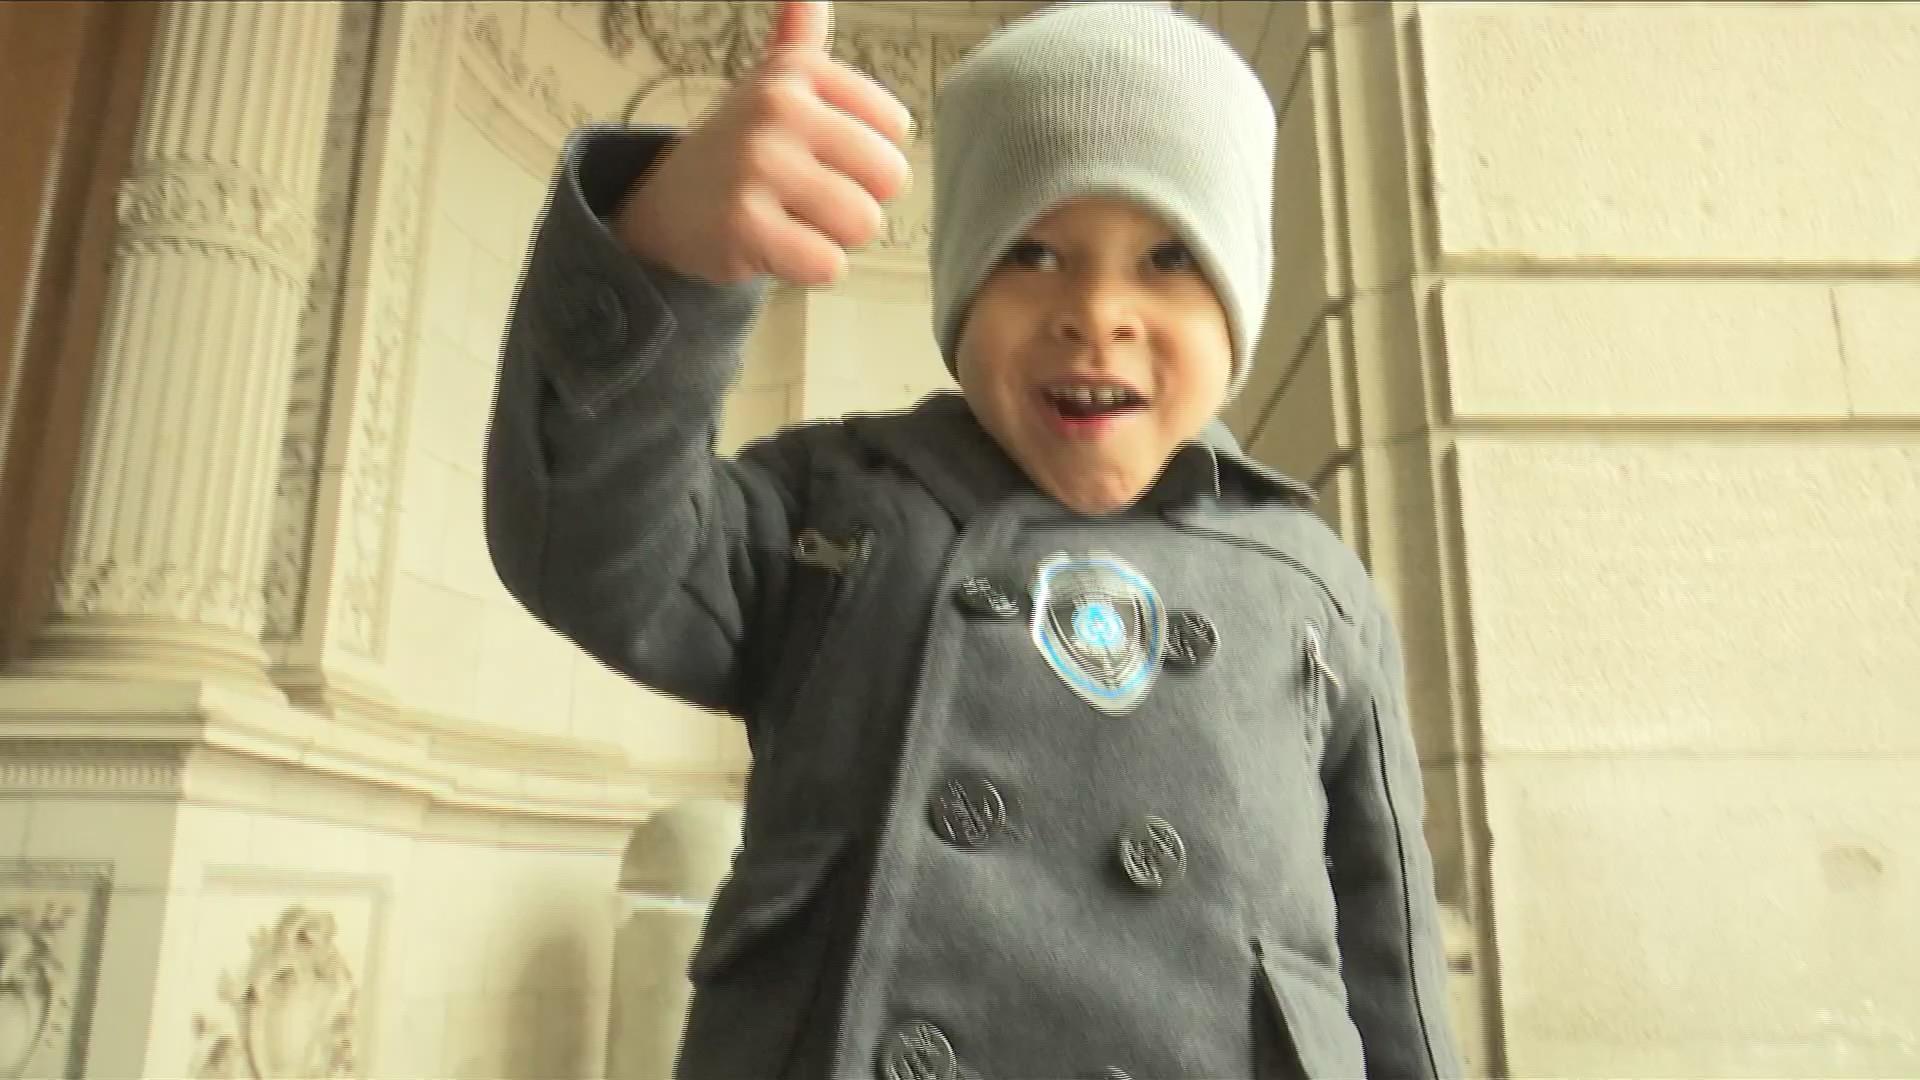 Local boy demonstrates spirit of Thanksgiving